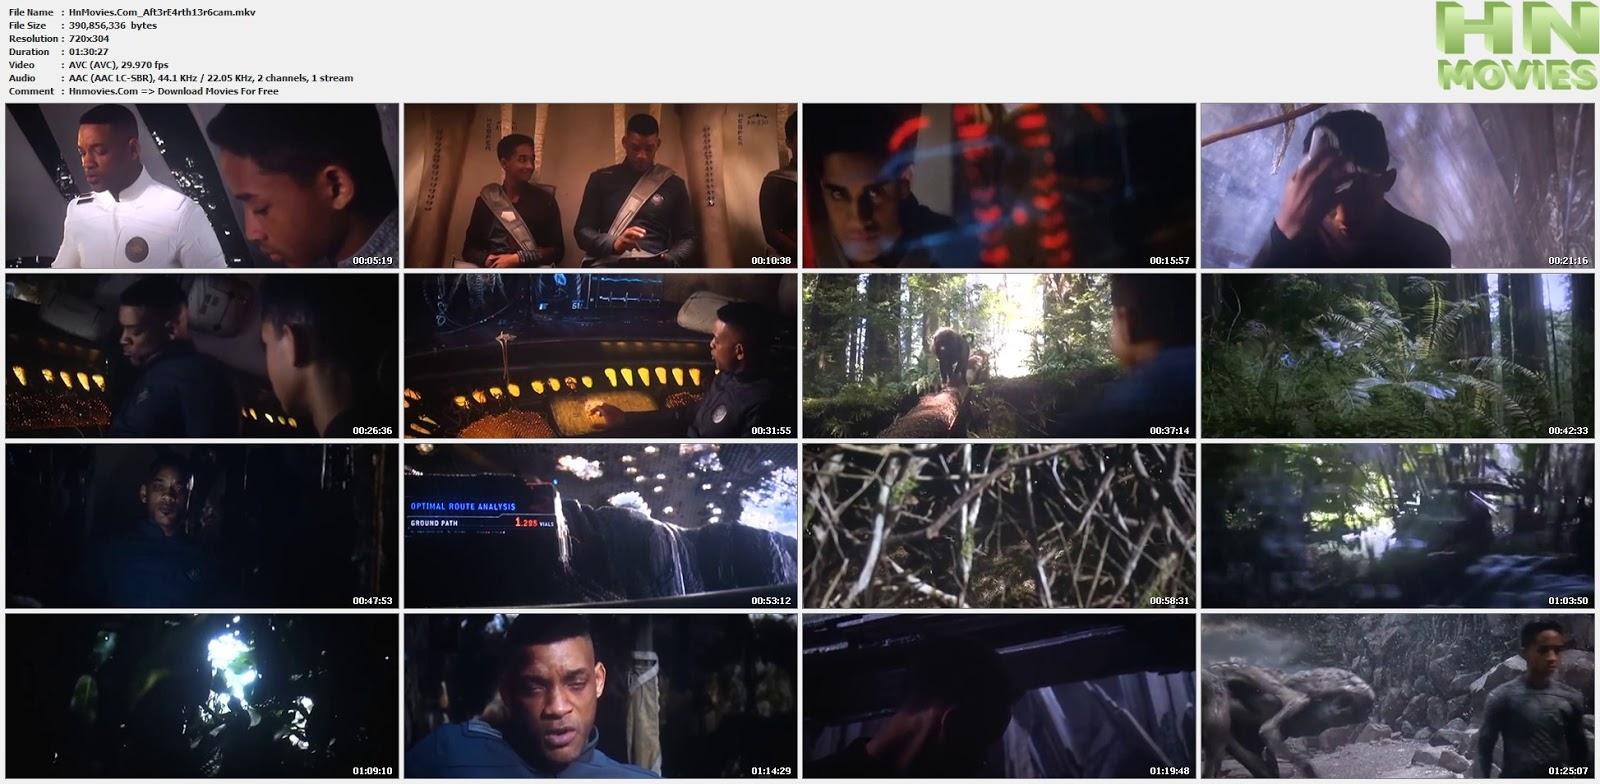 HnMovies.Com Aft3rE4rth13r6cam.mkv